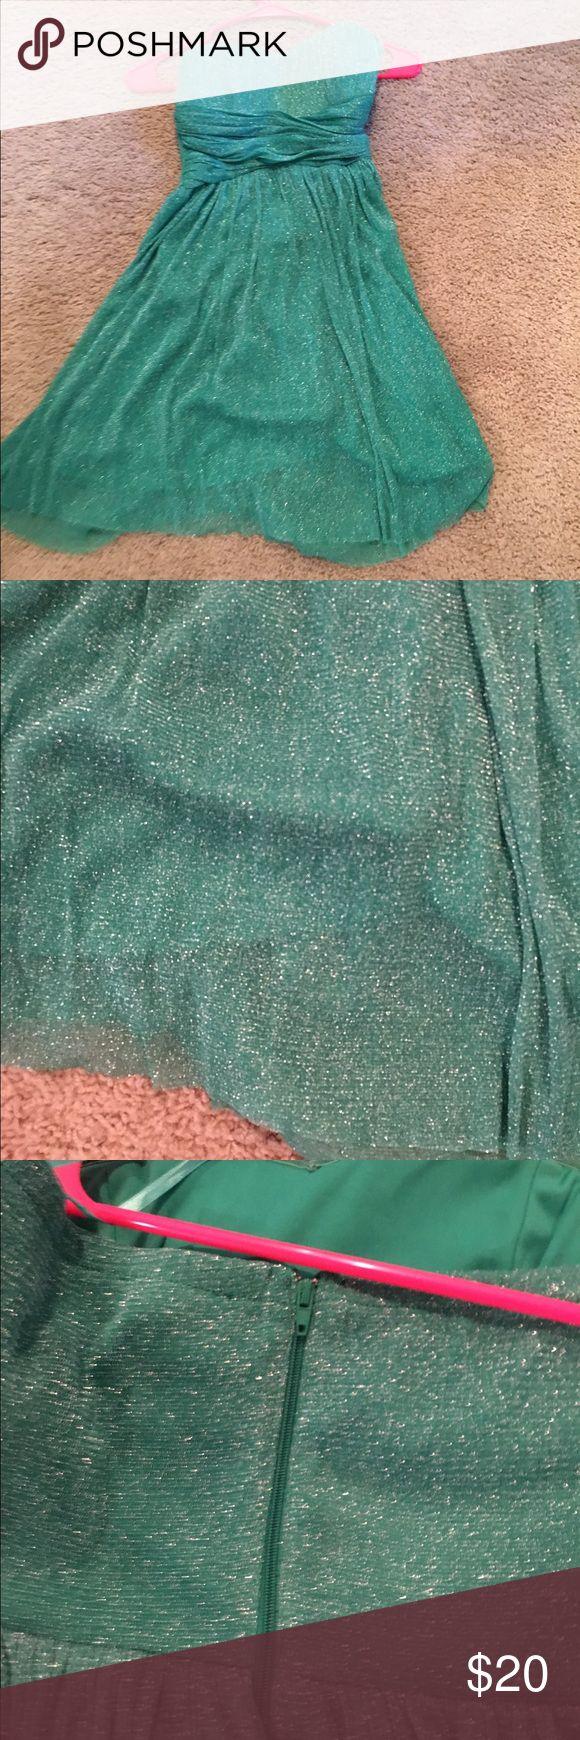 Green/teal sparkly strapless mini dress never worn Green/teal sparkly strapless mini dress never worn delias Dresses Strapless